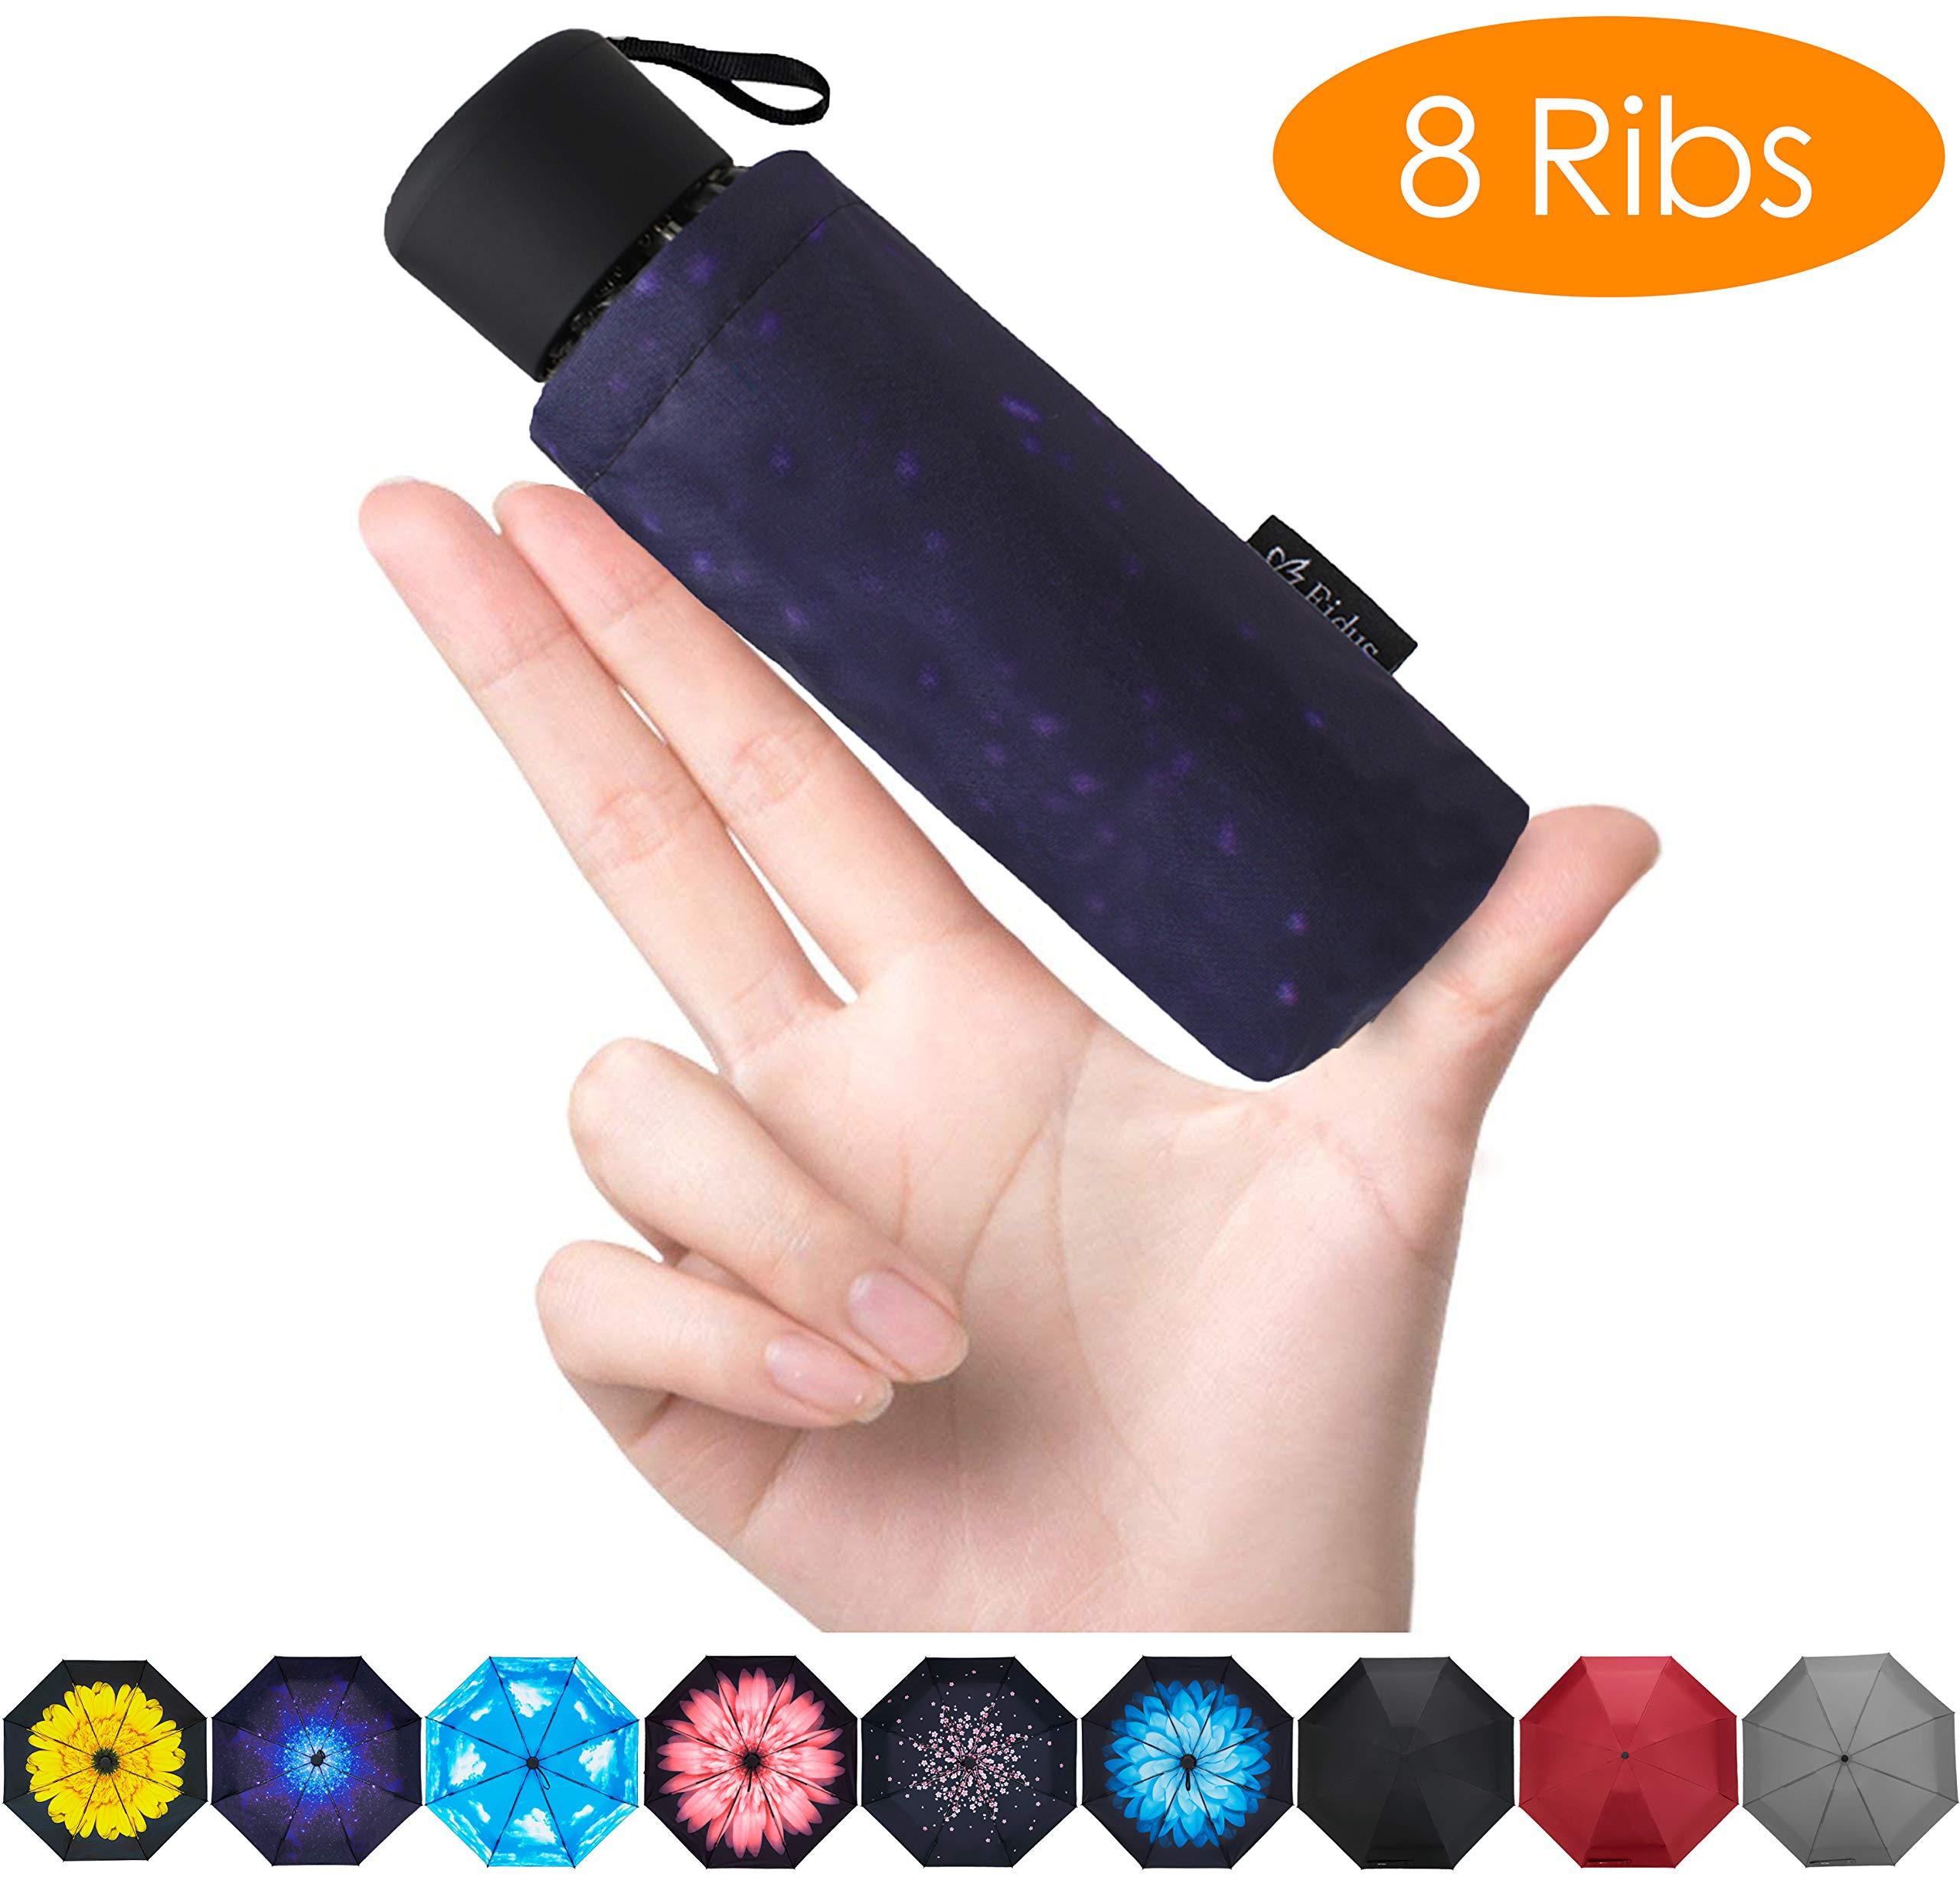 FidusUpgraded 8 Ribs Mini Portable Sun&Rain Lightweight WindproofUmbrella - Compact Parasol Outdoor Travel Umbrella for MenWomen Kids-Starry Sky by Fidus